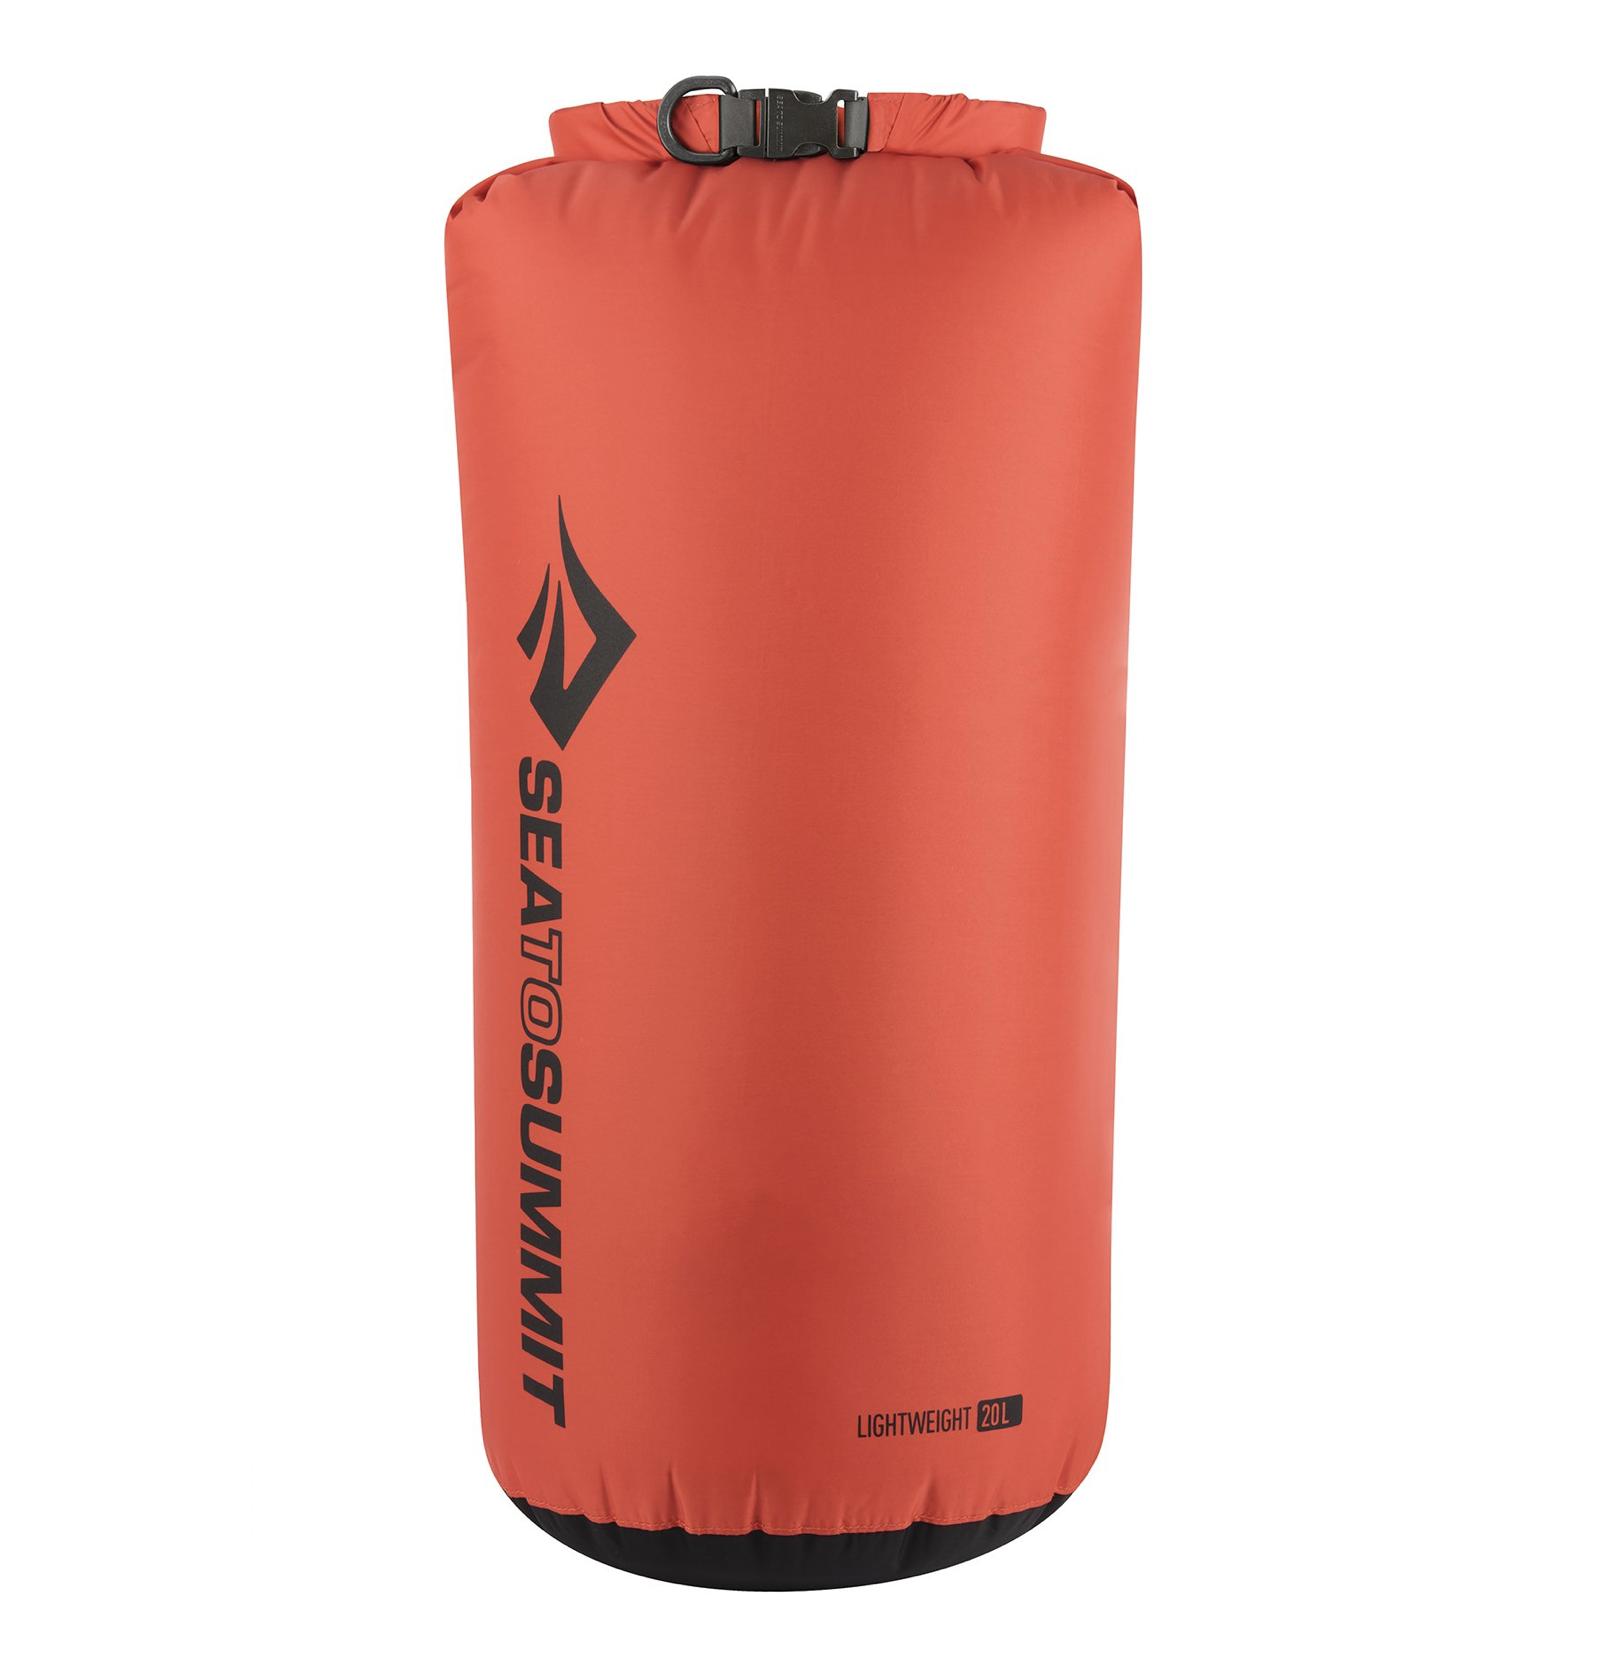 Bilde av Sea To Summit Lightweight Dry Sack 20L Rød